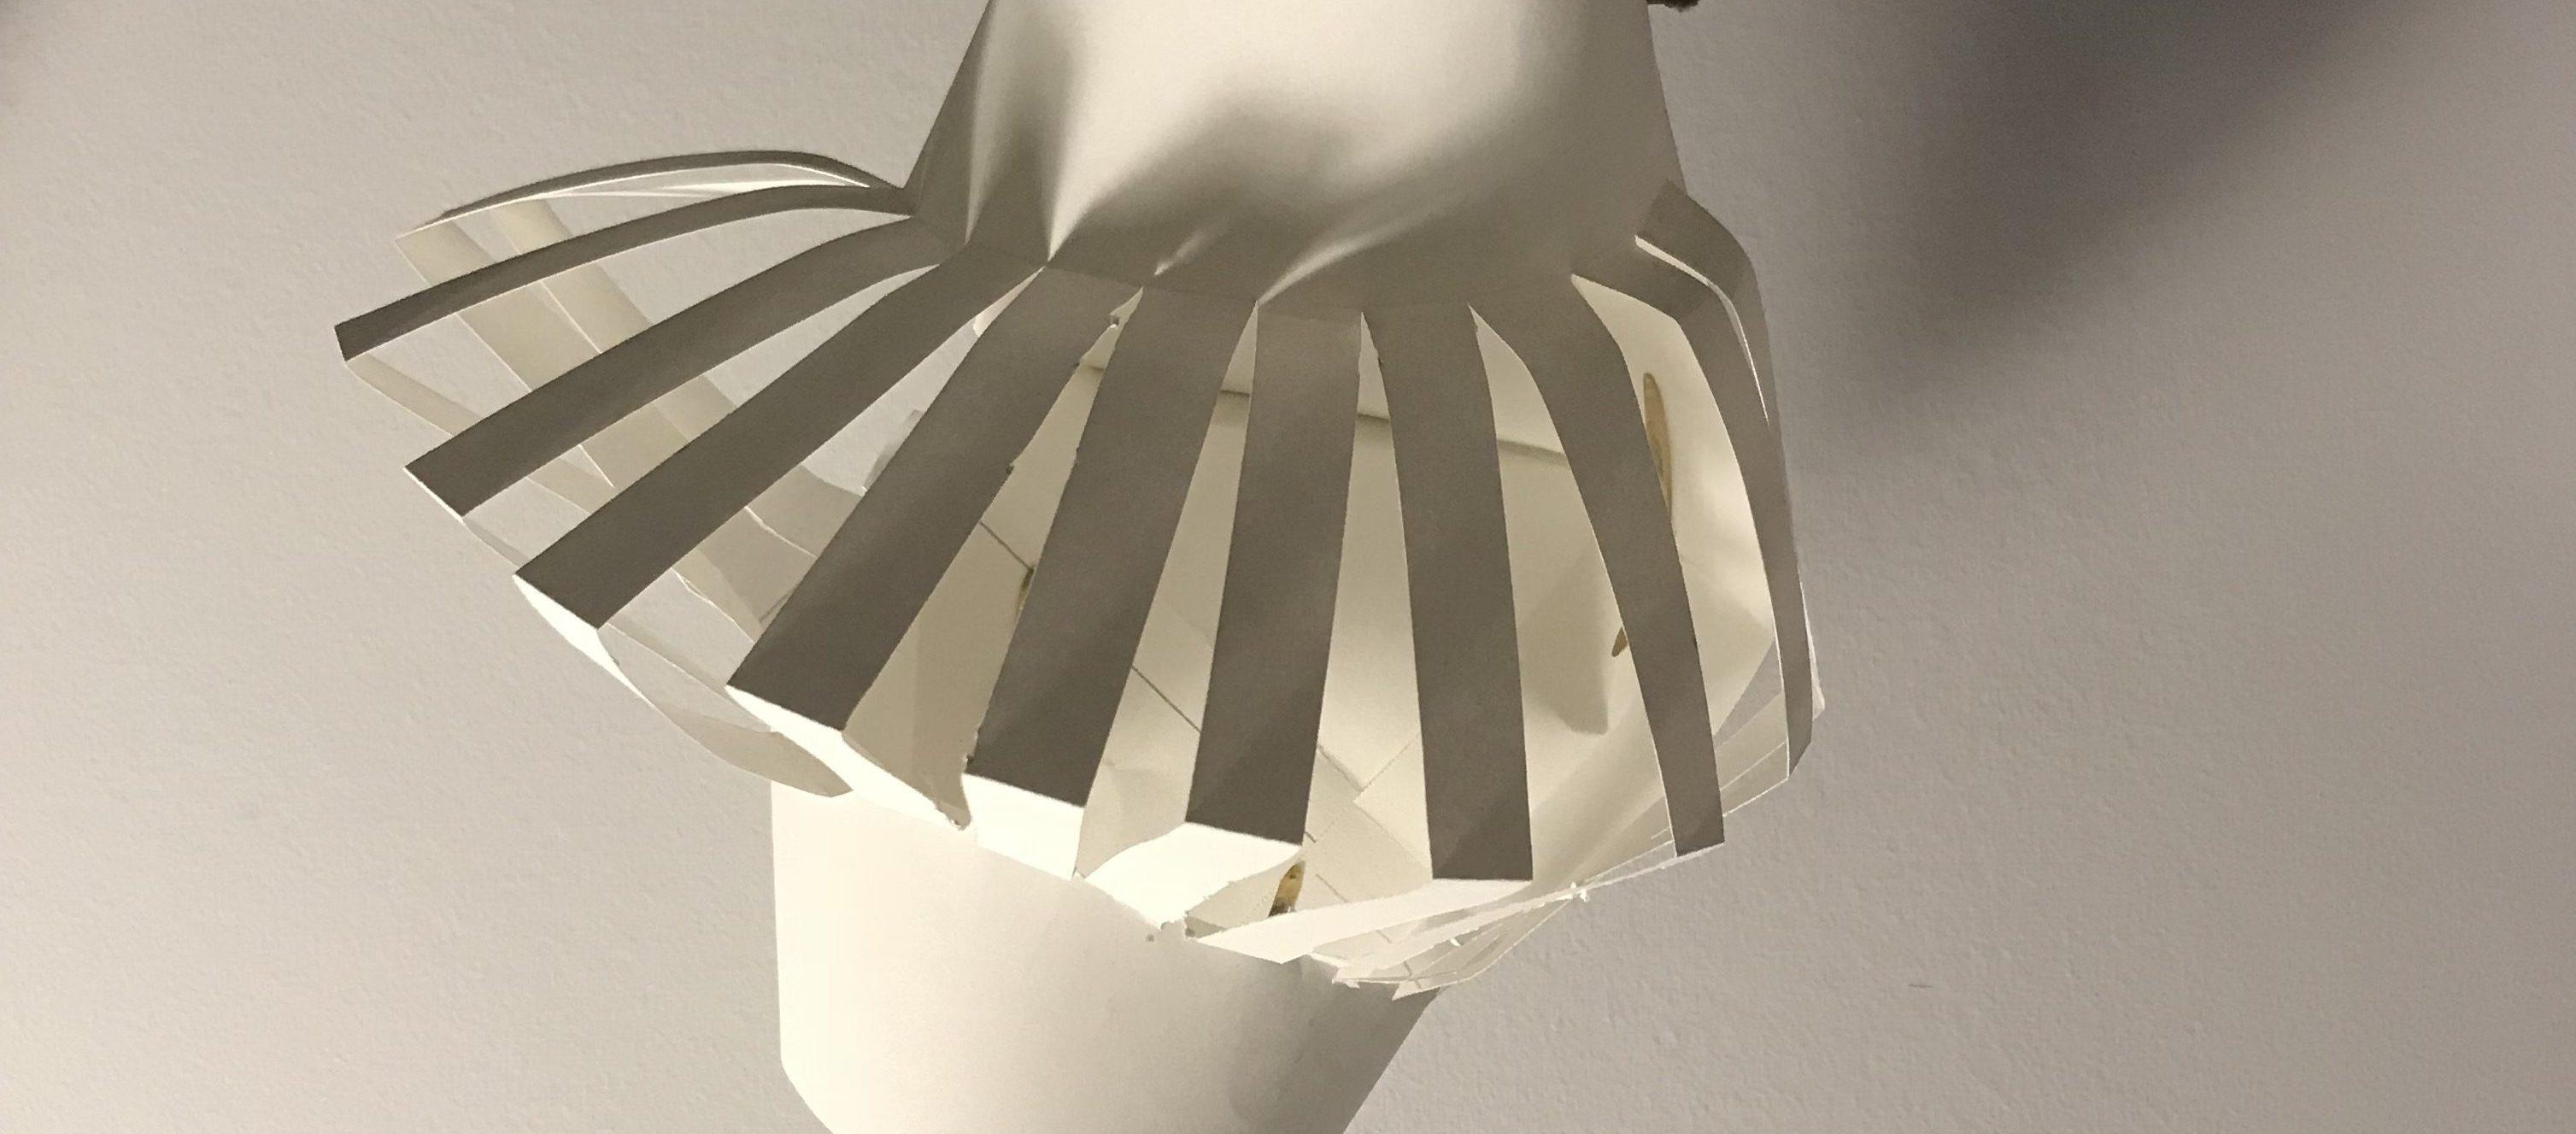 Artistic Response – Ai Weiwei